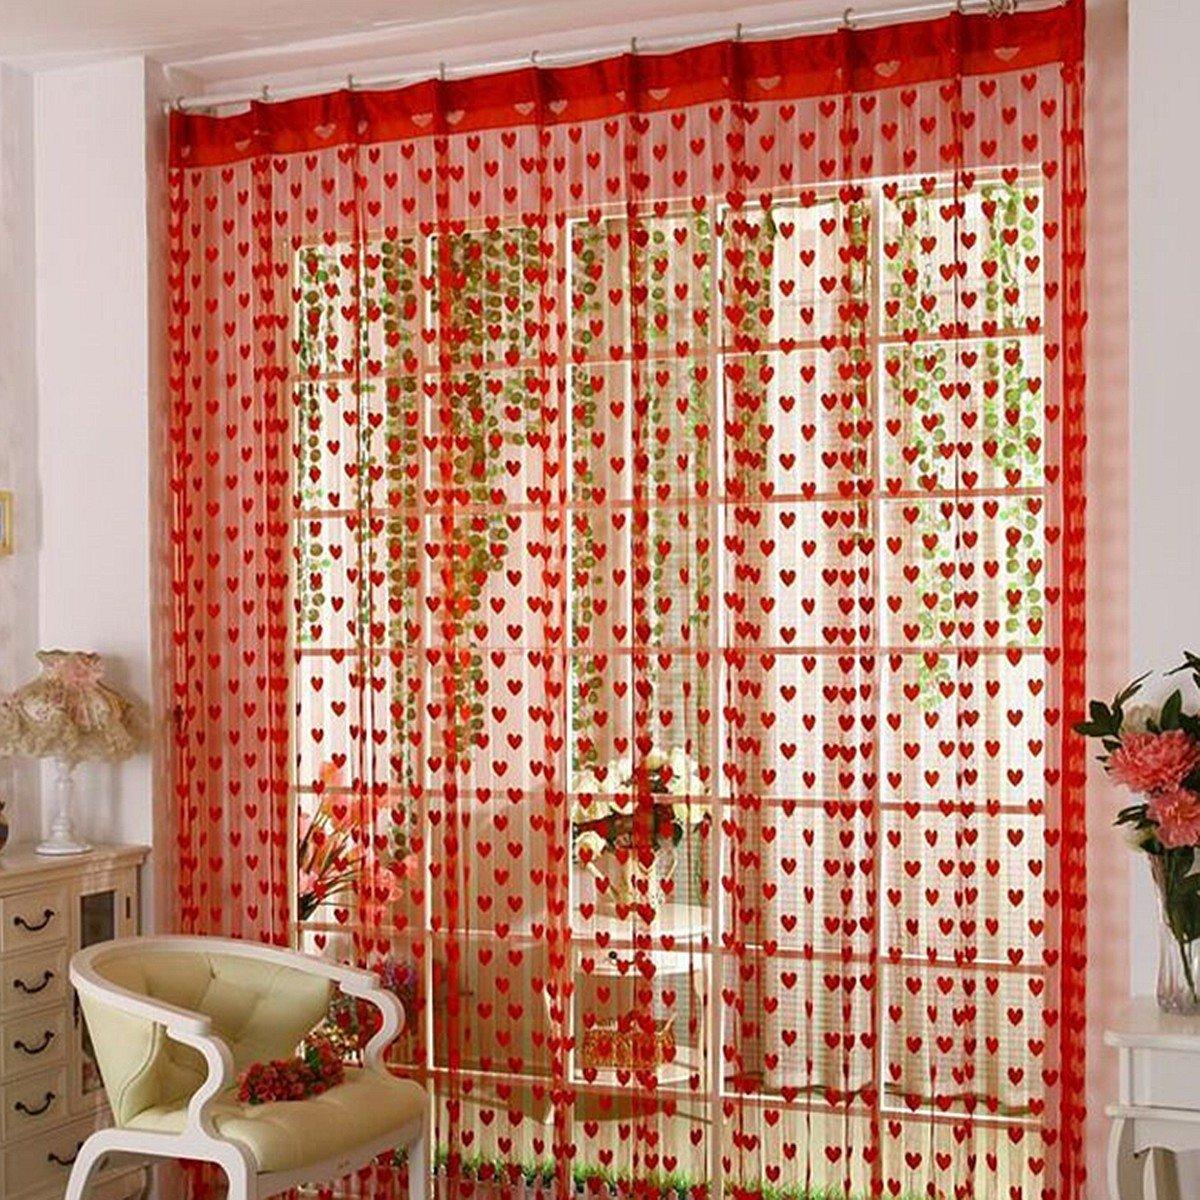 New Line Drop String Door Window Curtain Divider Tassel Valance Home DIY Decor